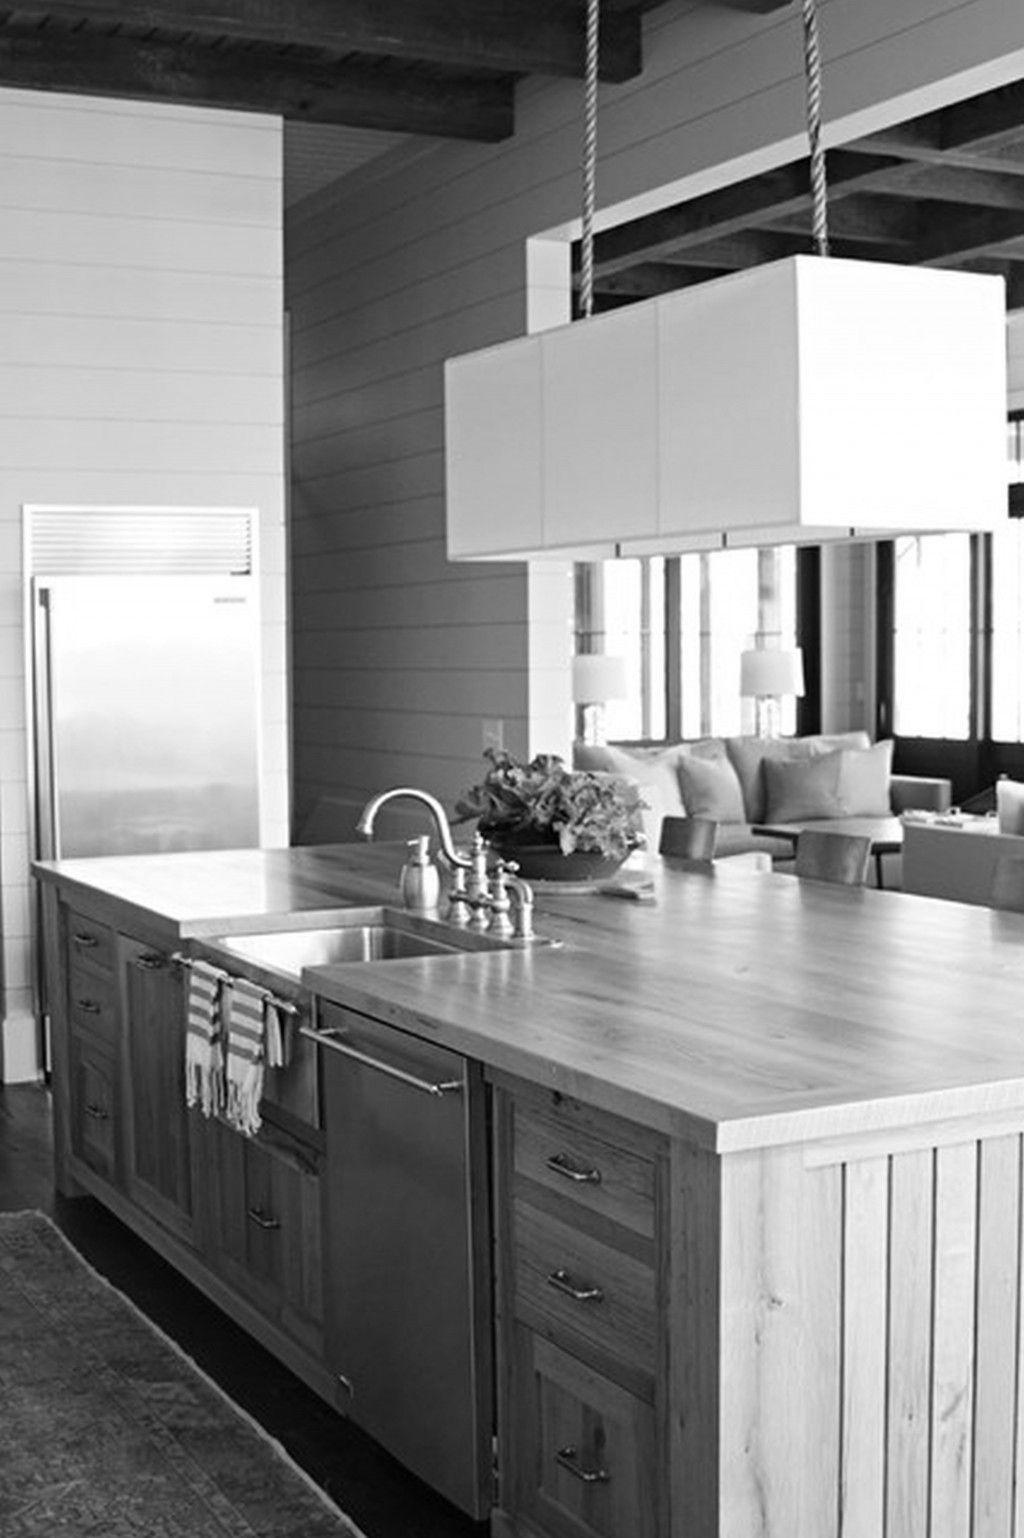 Kitchen Layout Design Tool: Beautiful Home Hardware Kitchen Design Tool With Home